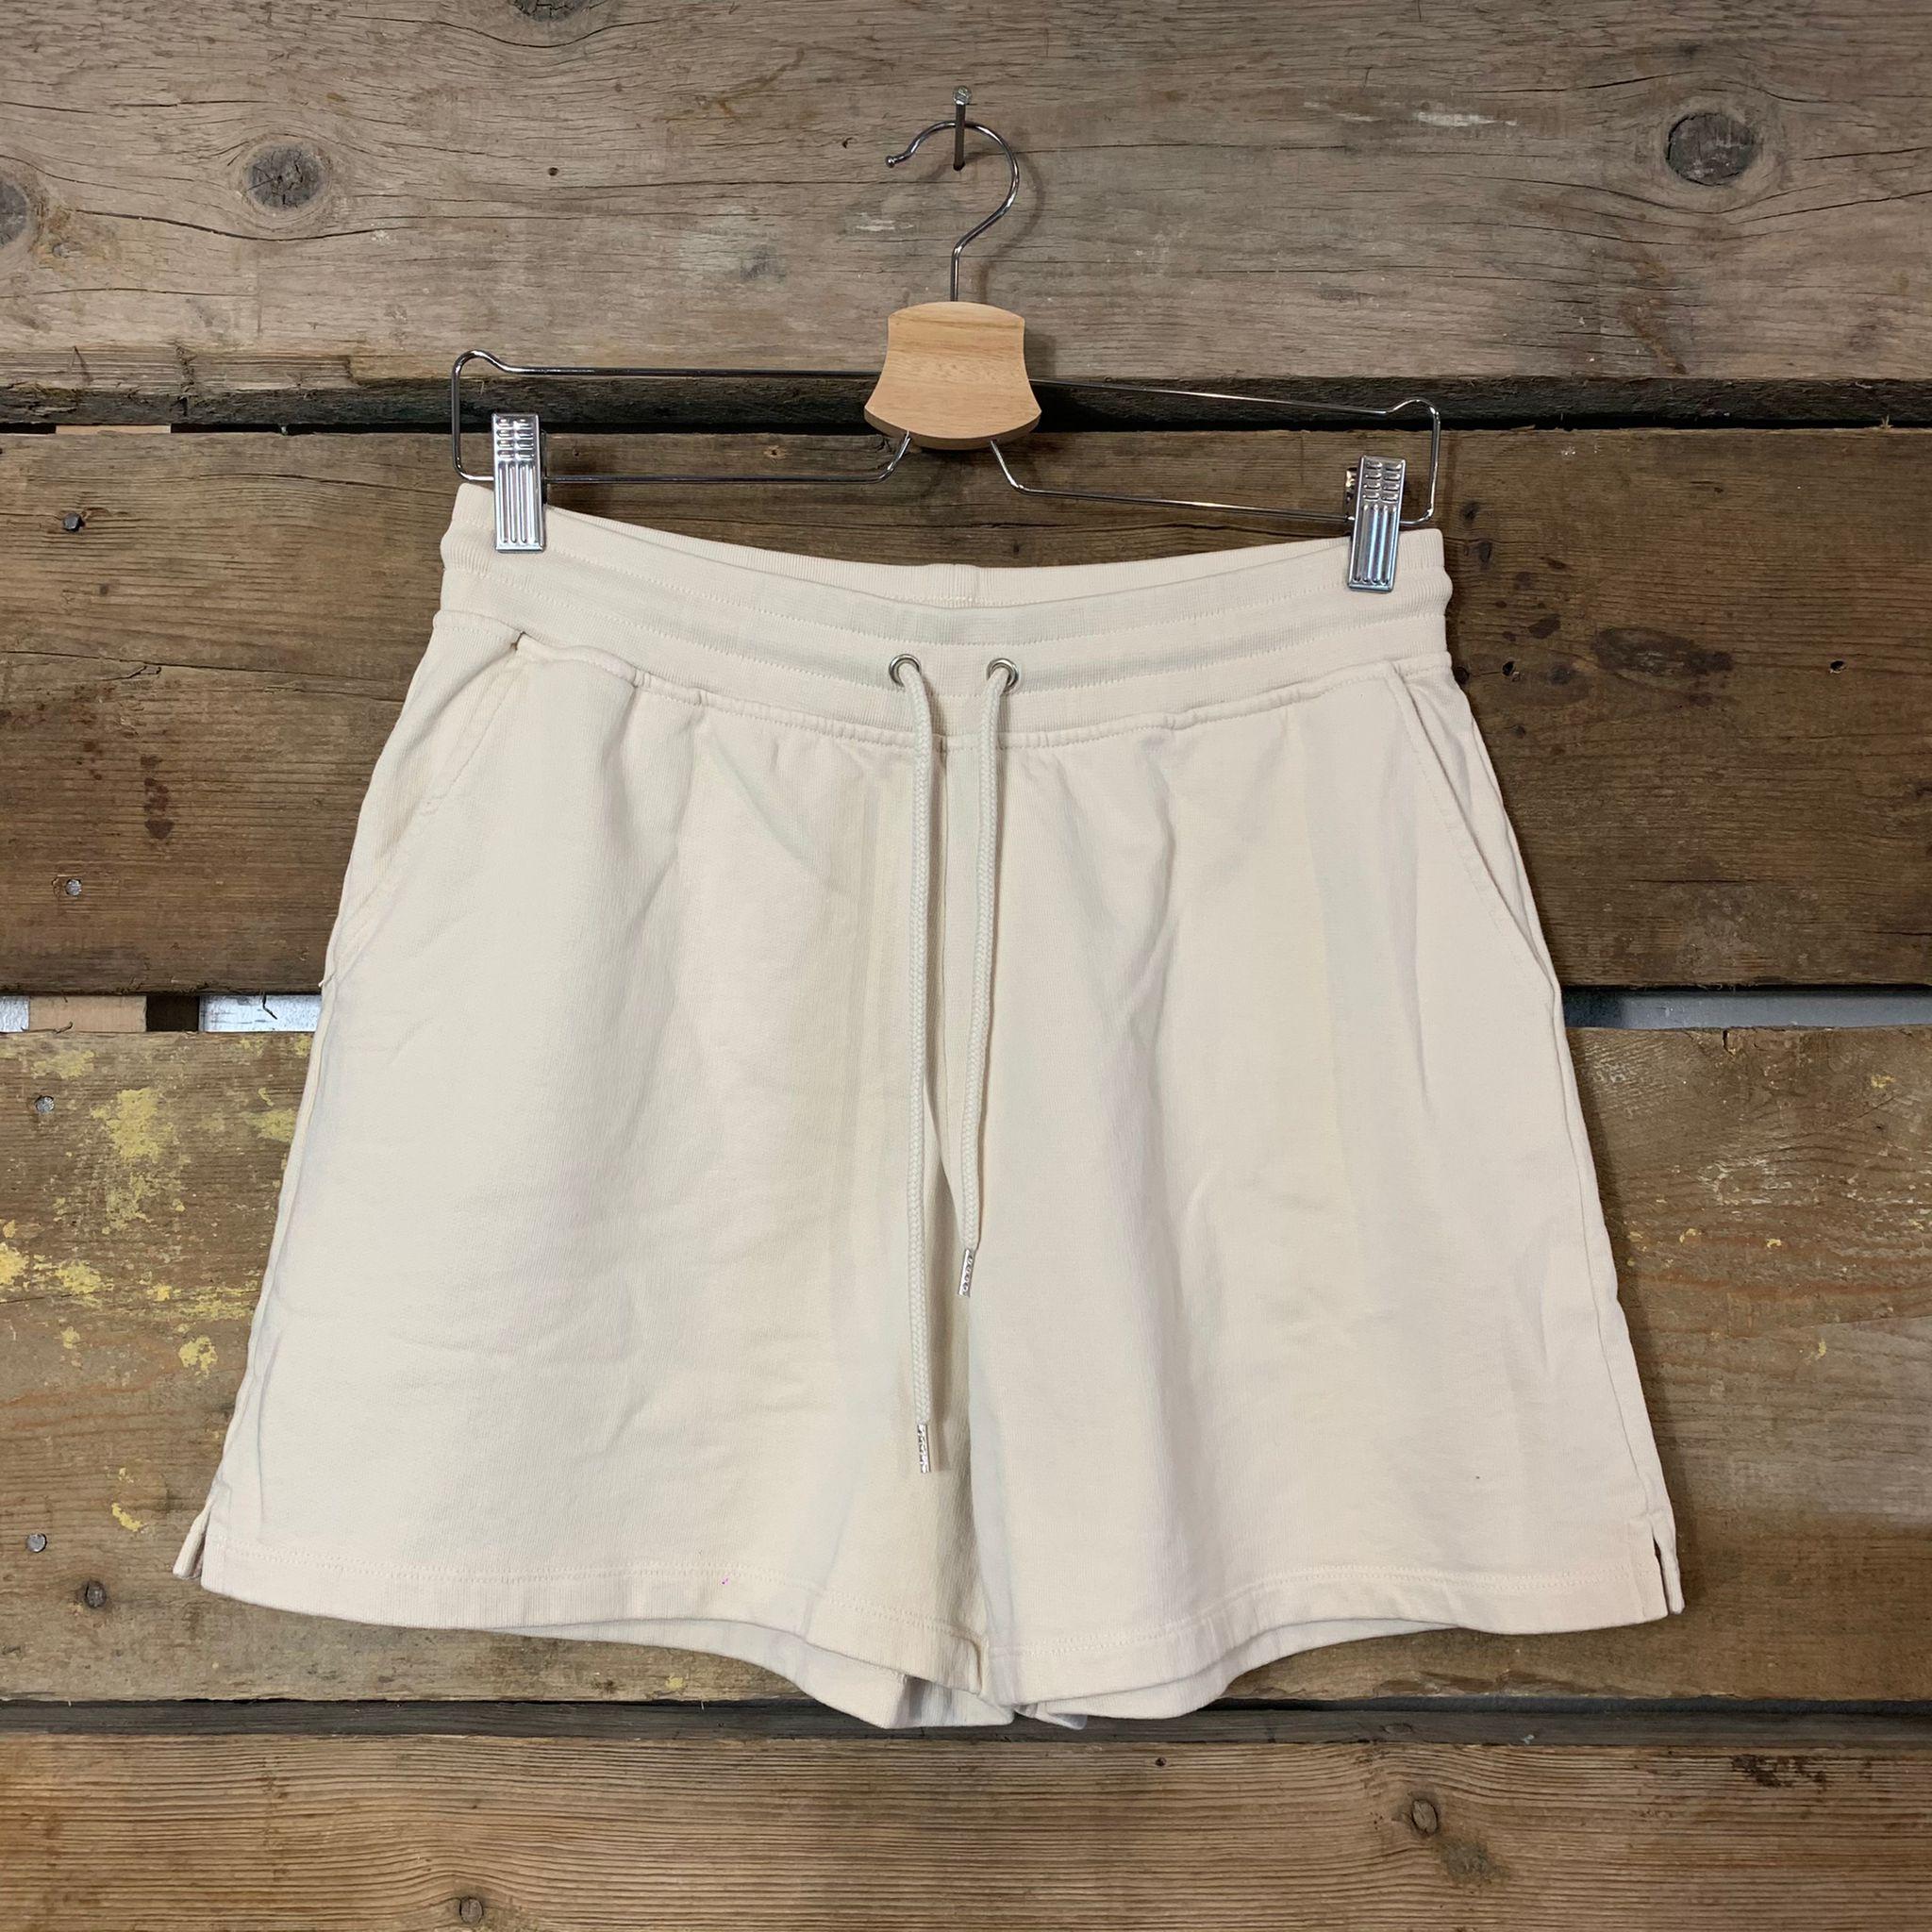 Pantaloncini Colorful Standard 100% Organic Cotton Avorio